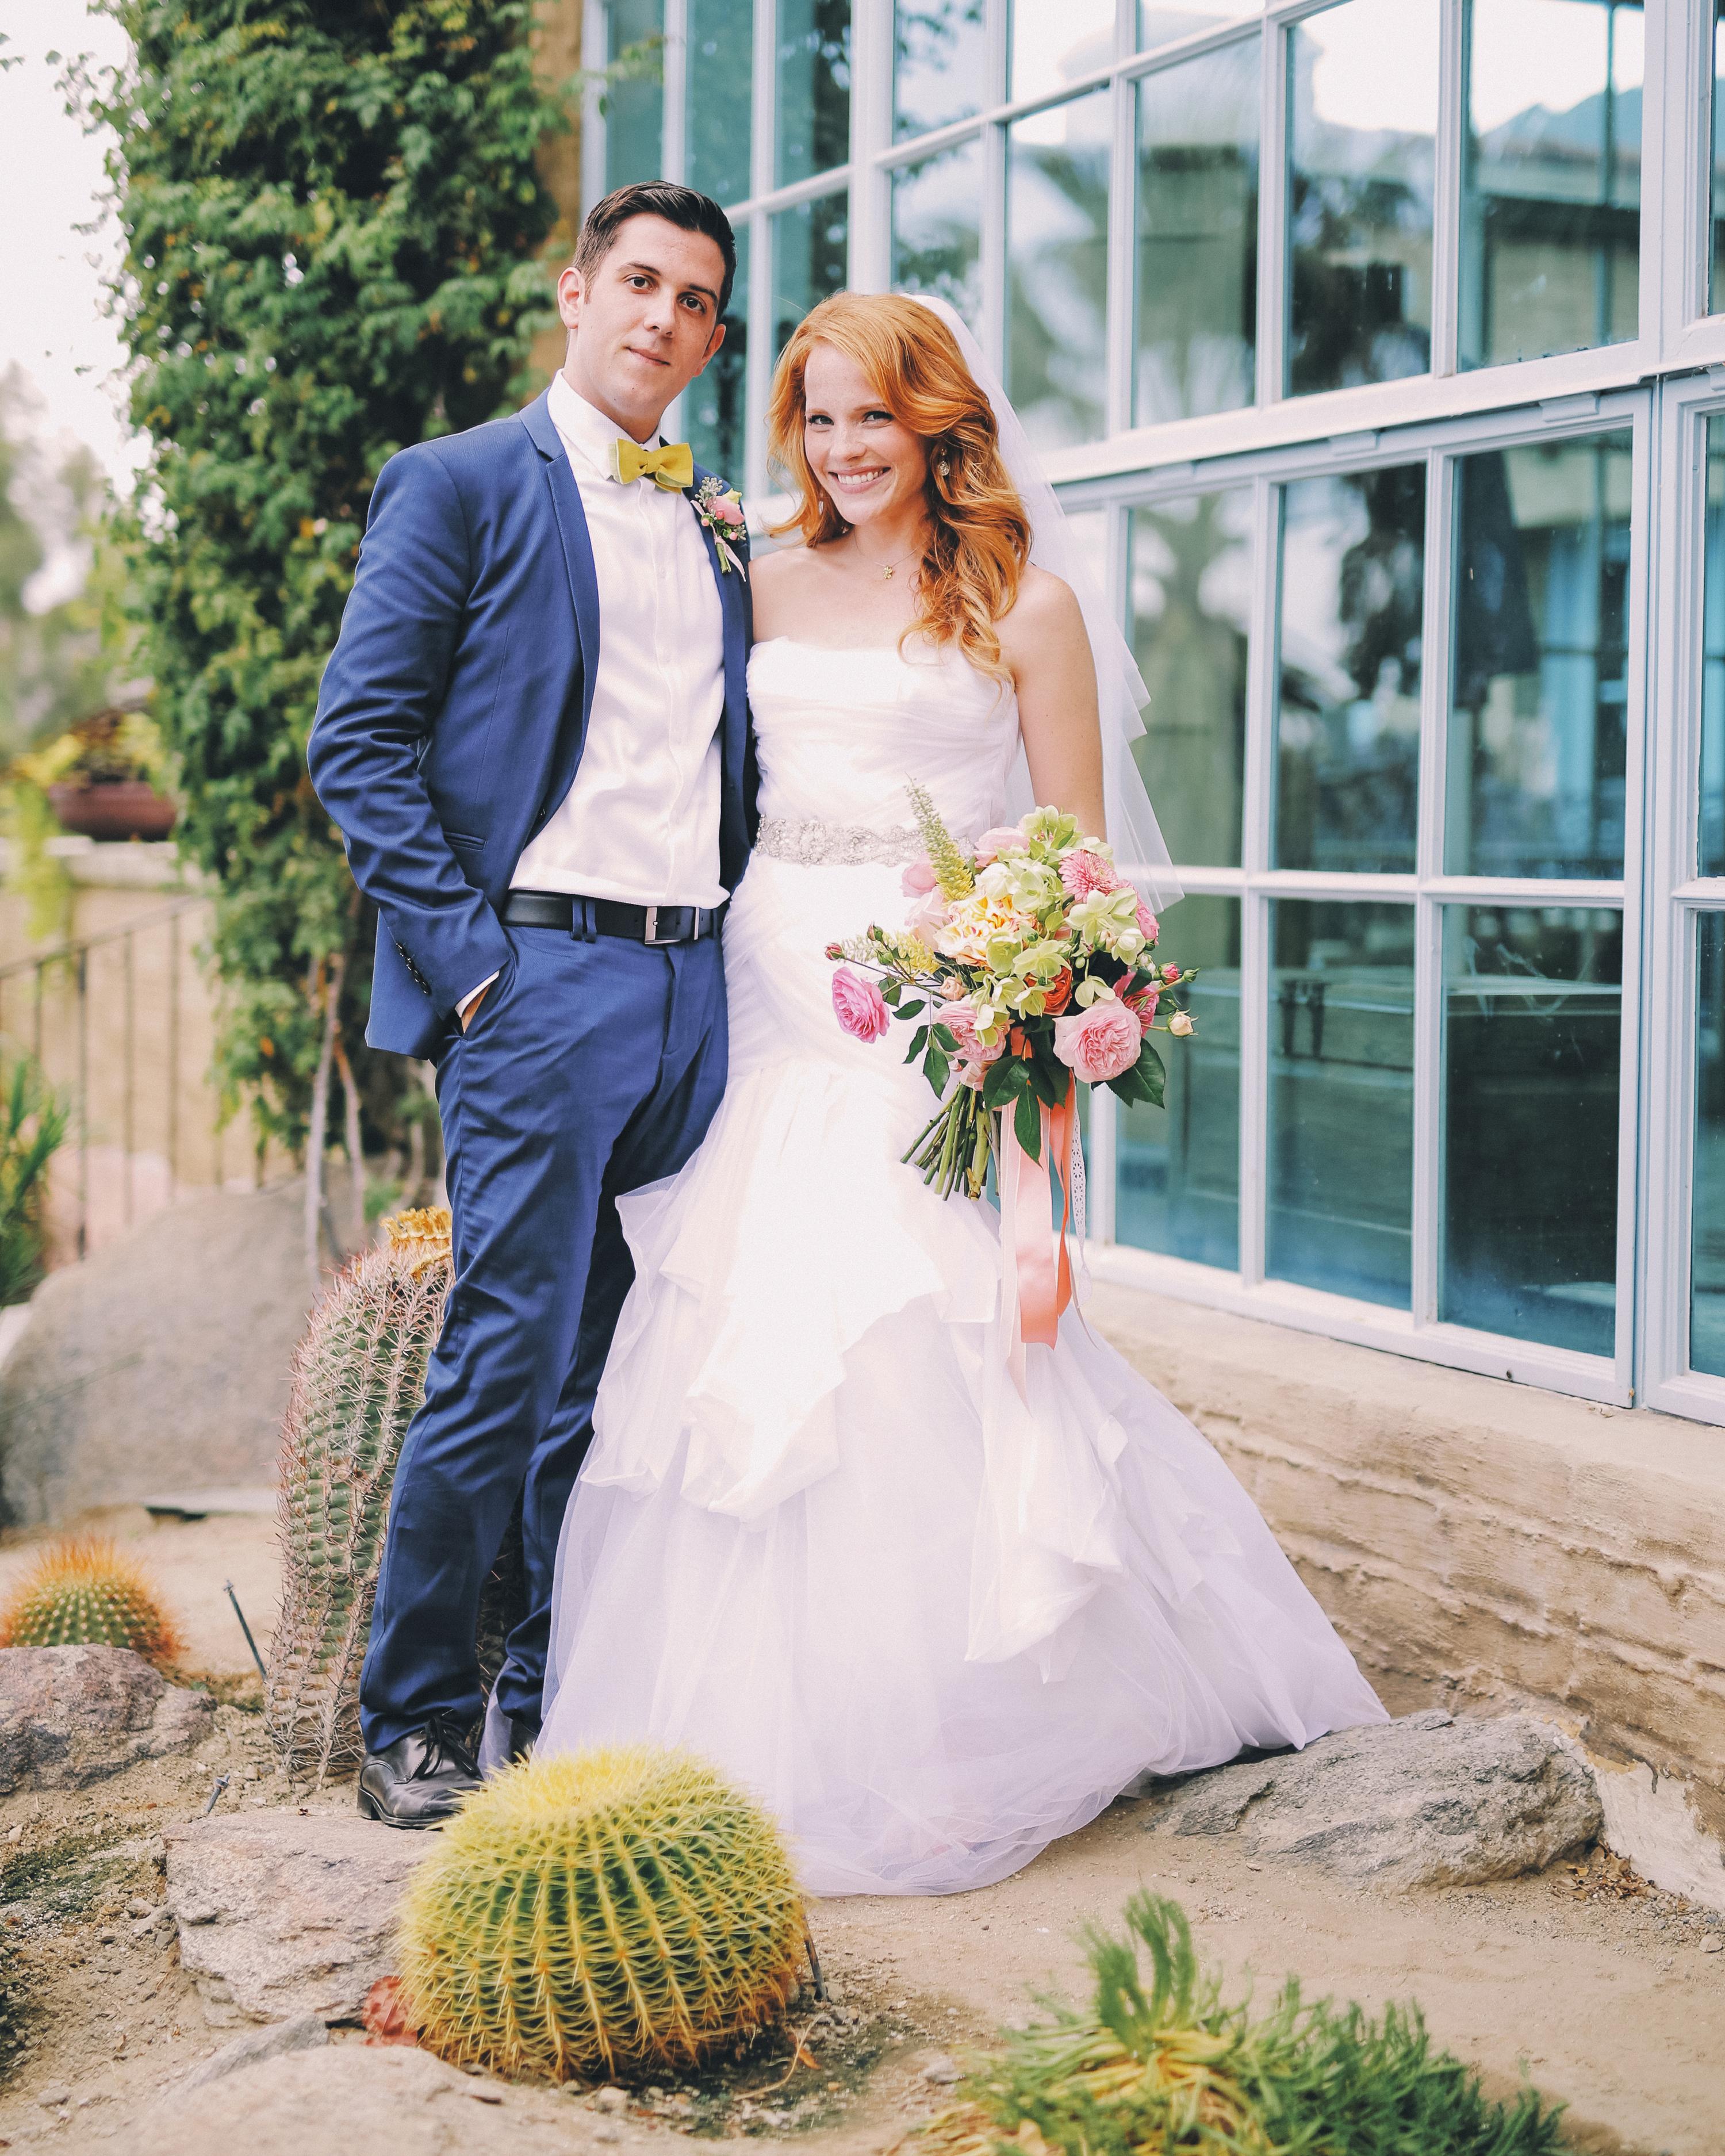 katie-brian-wedding-couple-3240-s111885-0515.jpg